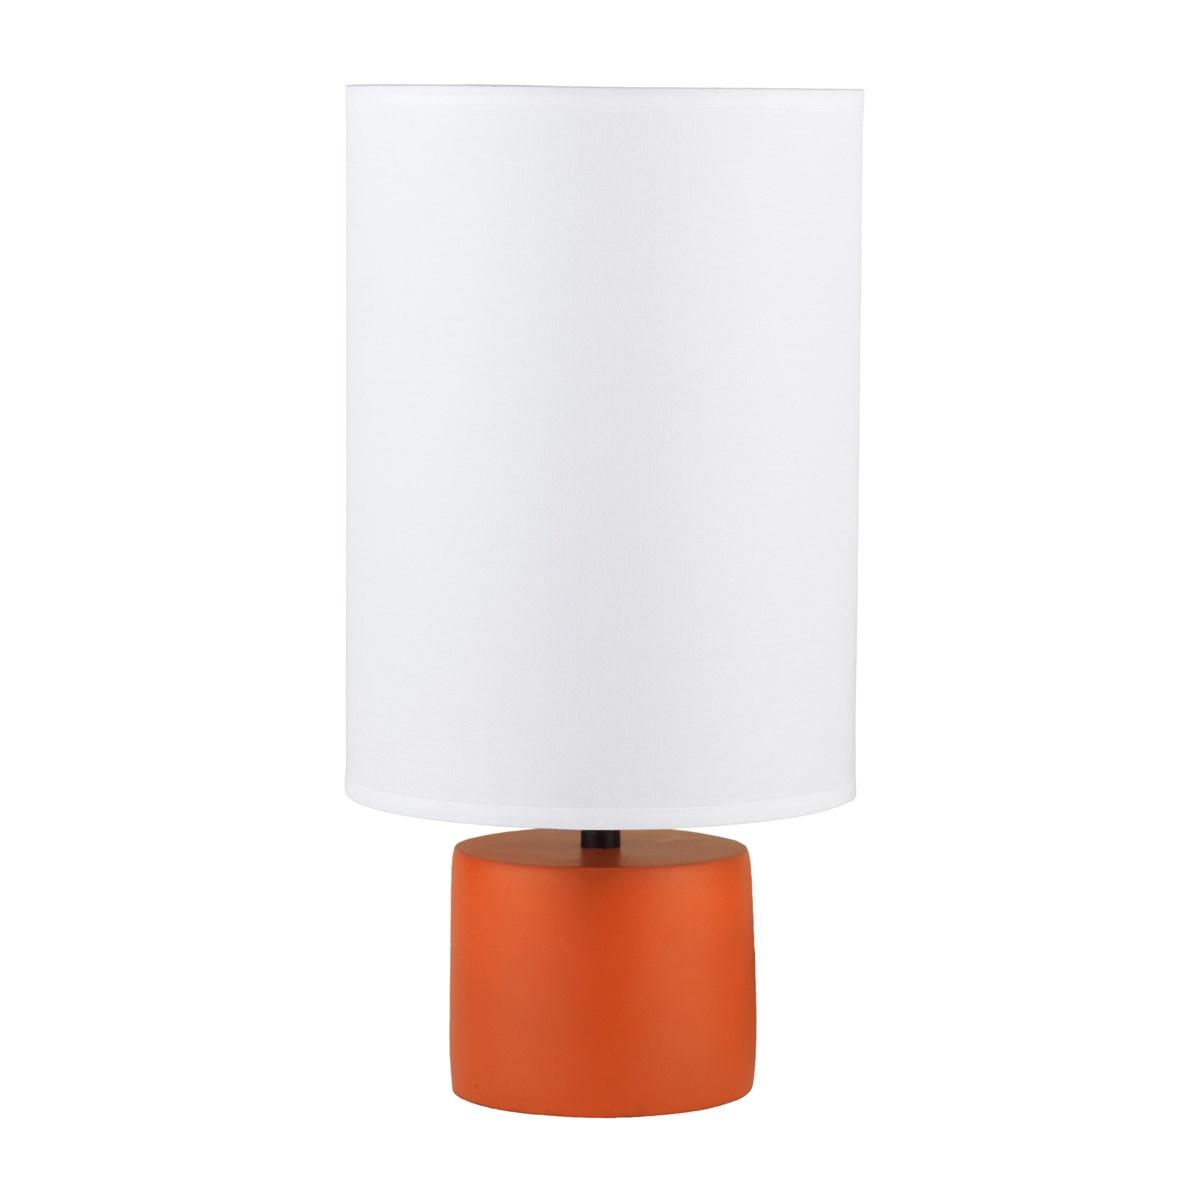 Lights up devo round table lamp table lamp neenas lighting geotapseo Images